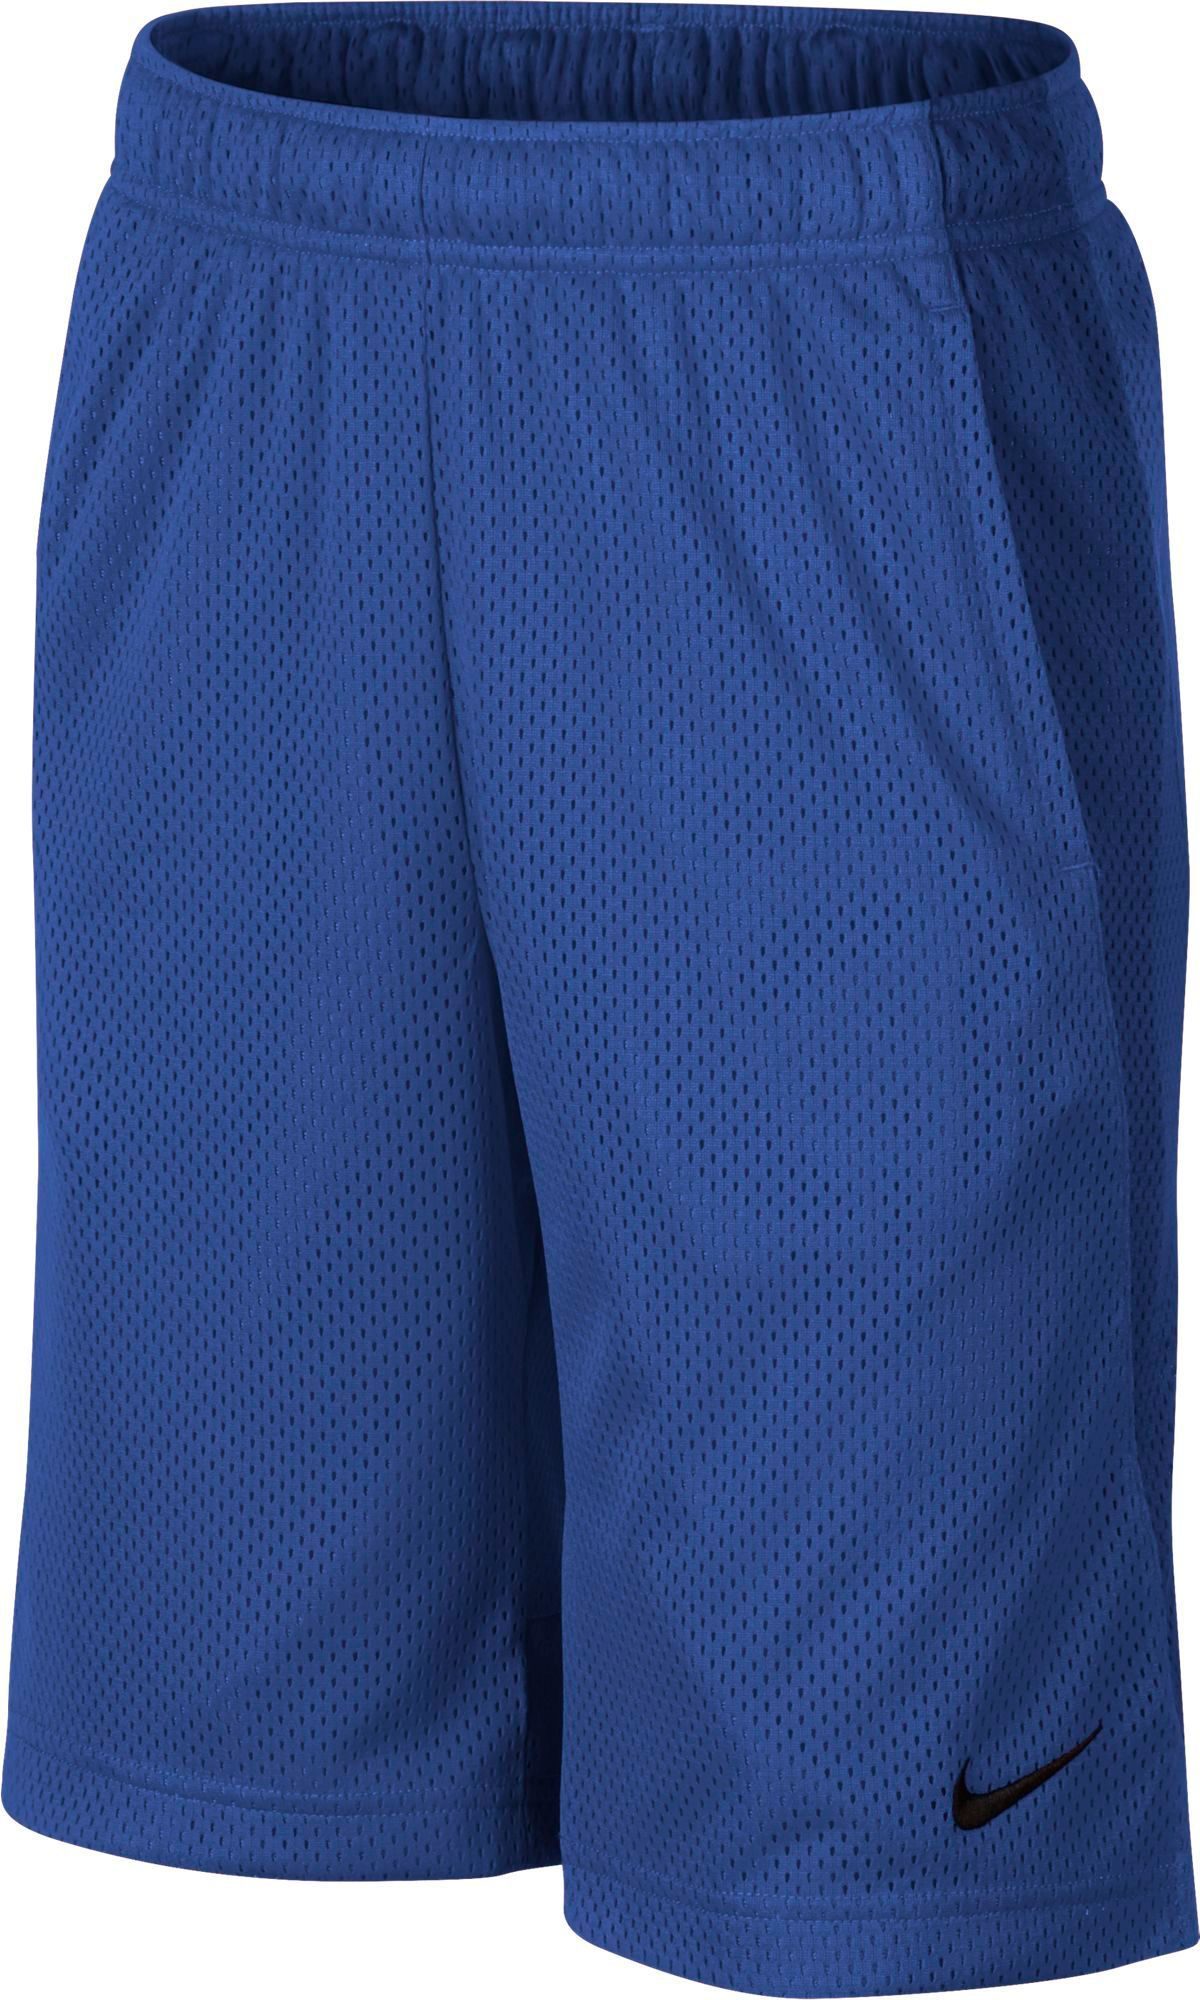 Nike boys monster mesh shorts size xs blue in 2020